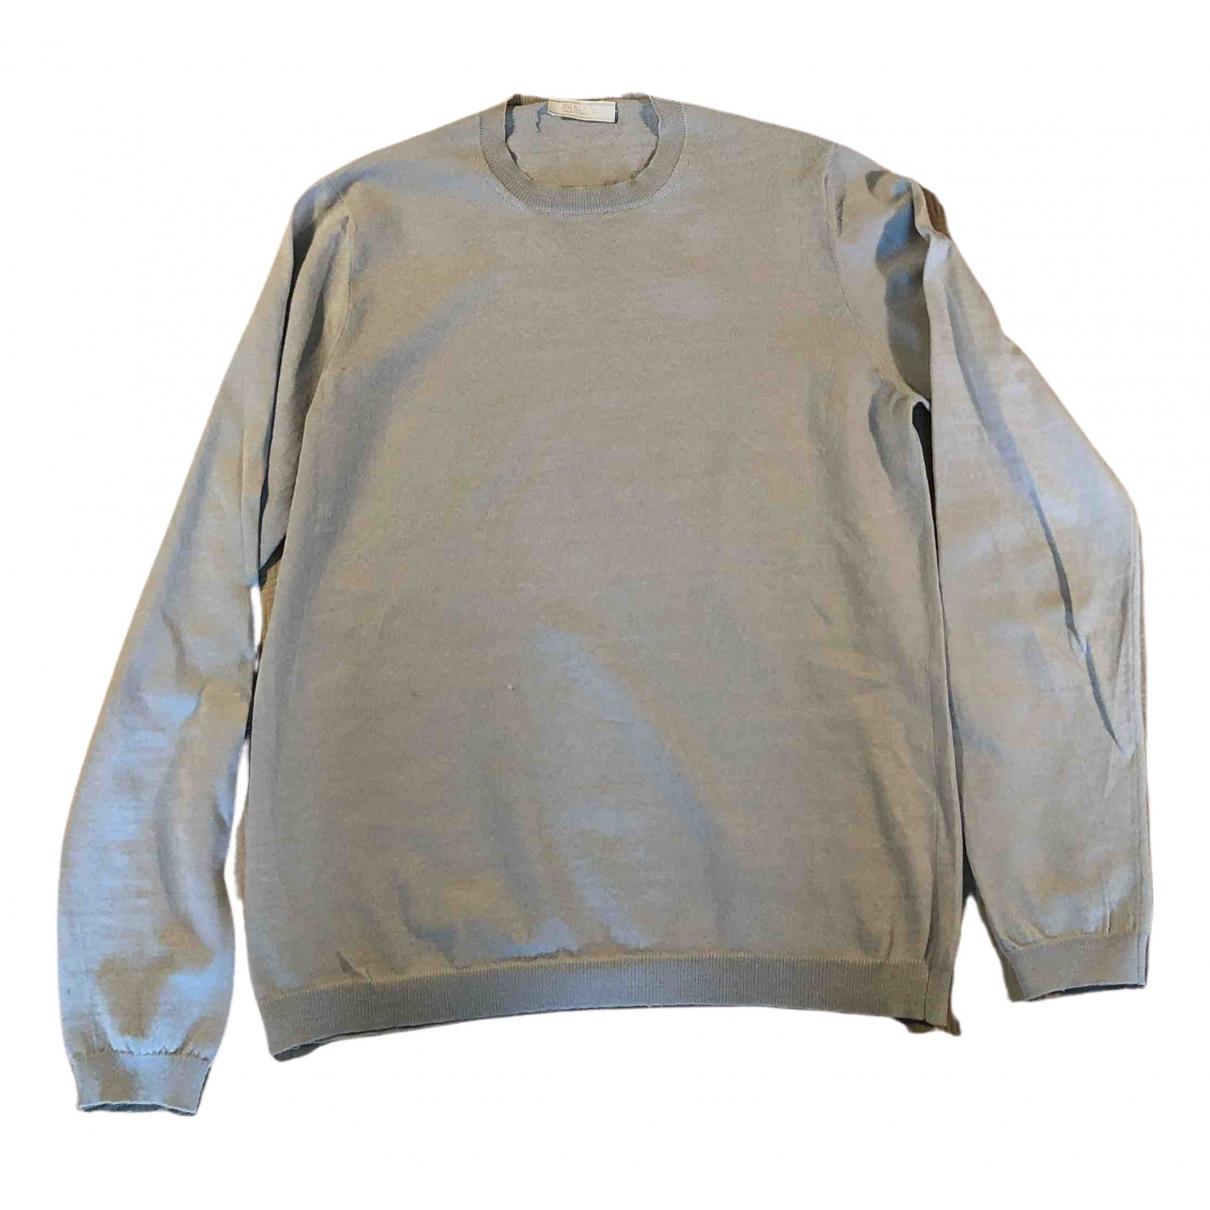 Prada N Grey Cotton Knitwear & Sweatshirts for Men 50 IT